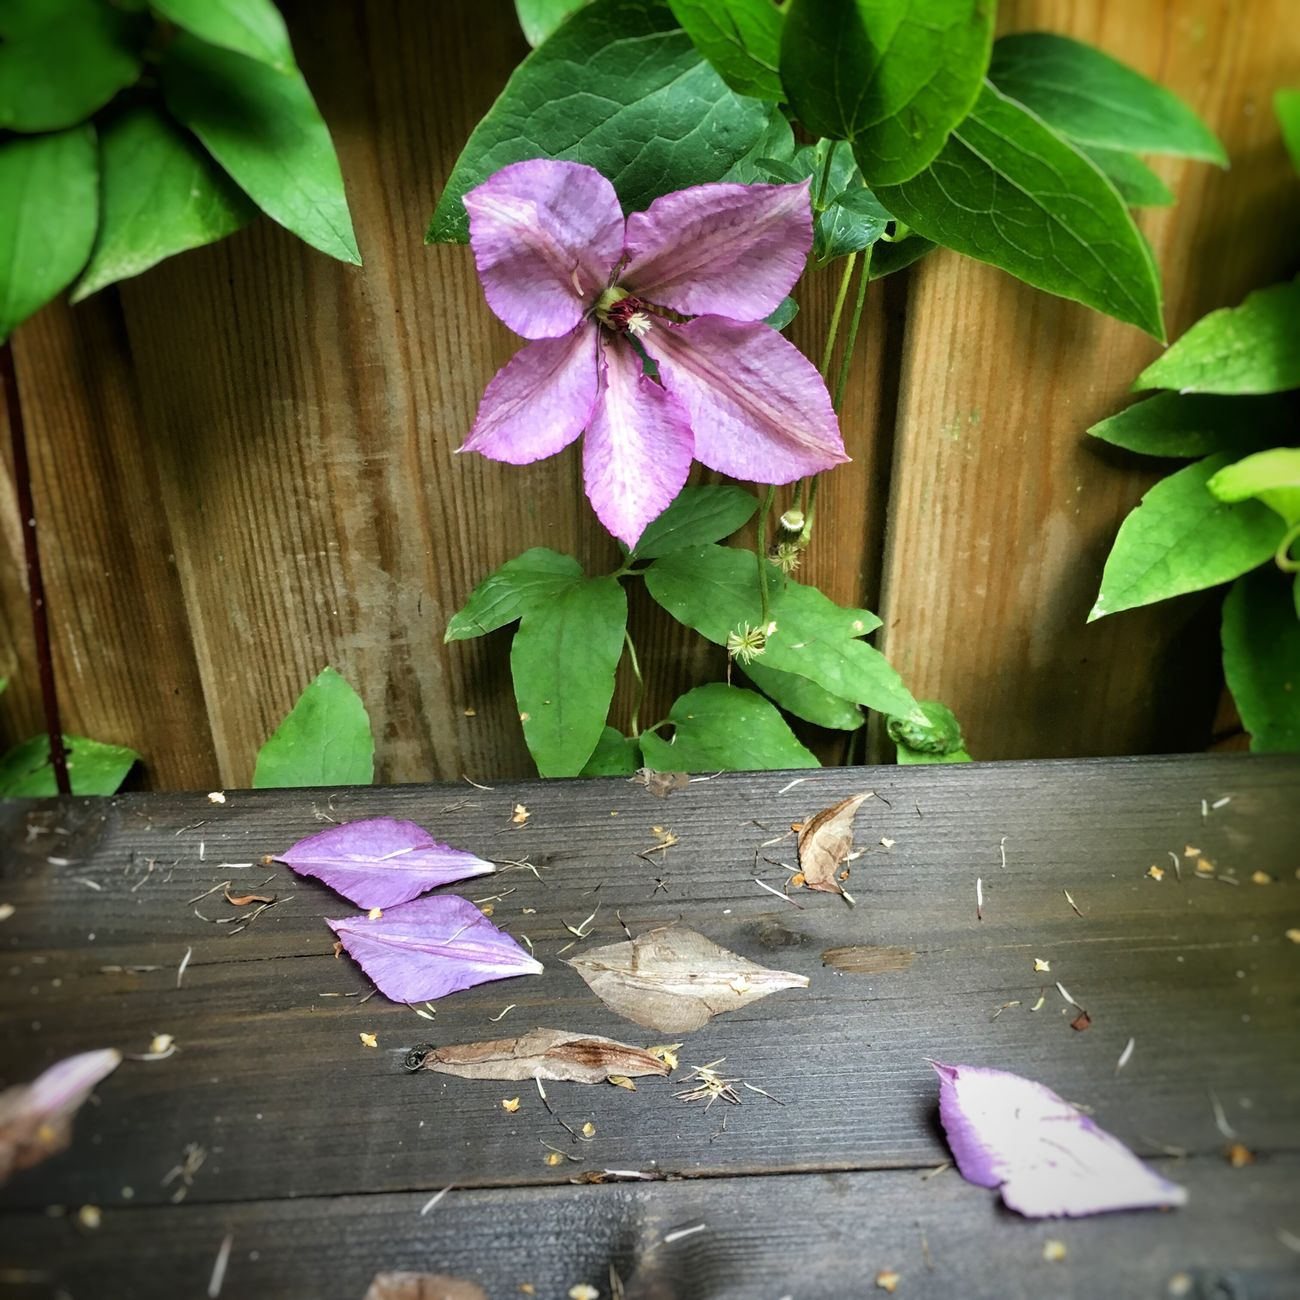 Flowers,Plants & Garden In My Garden Nature_collection Flowerporn Nature Photography